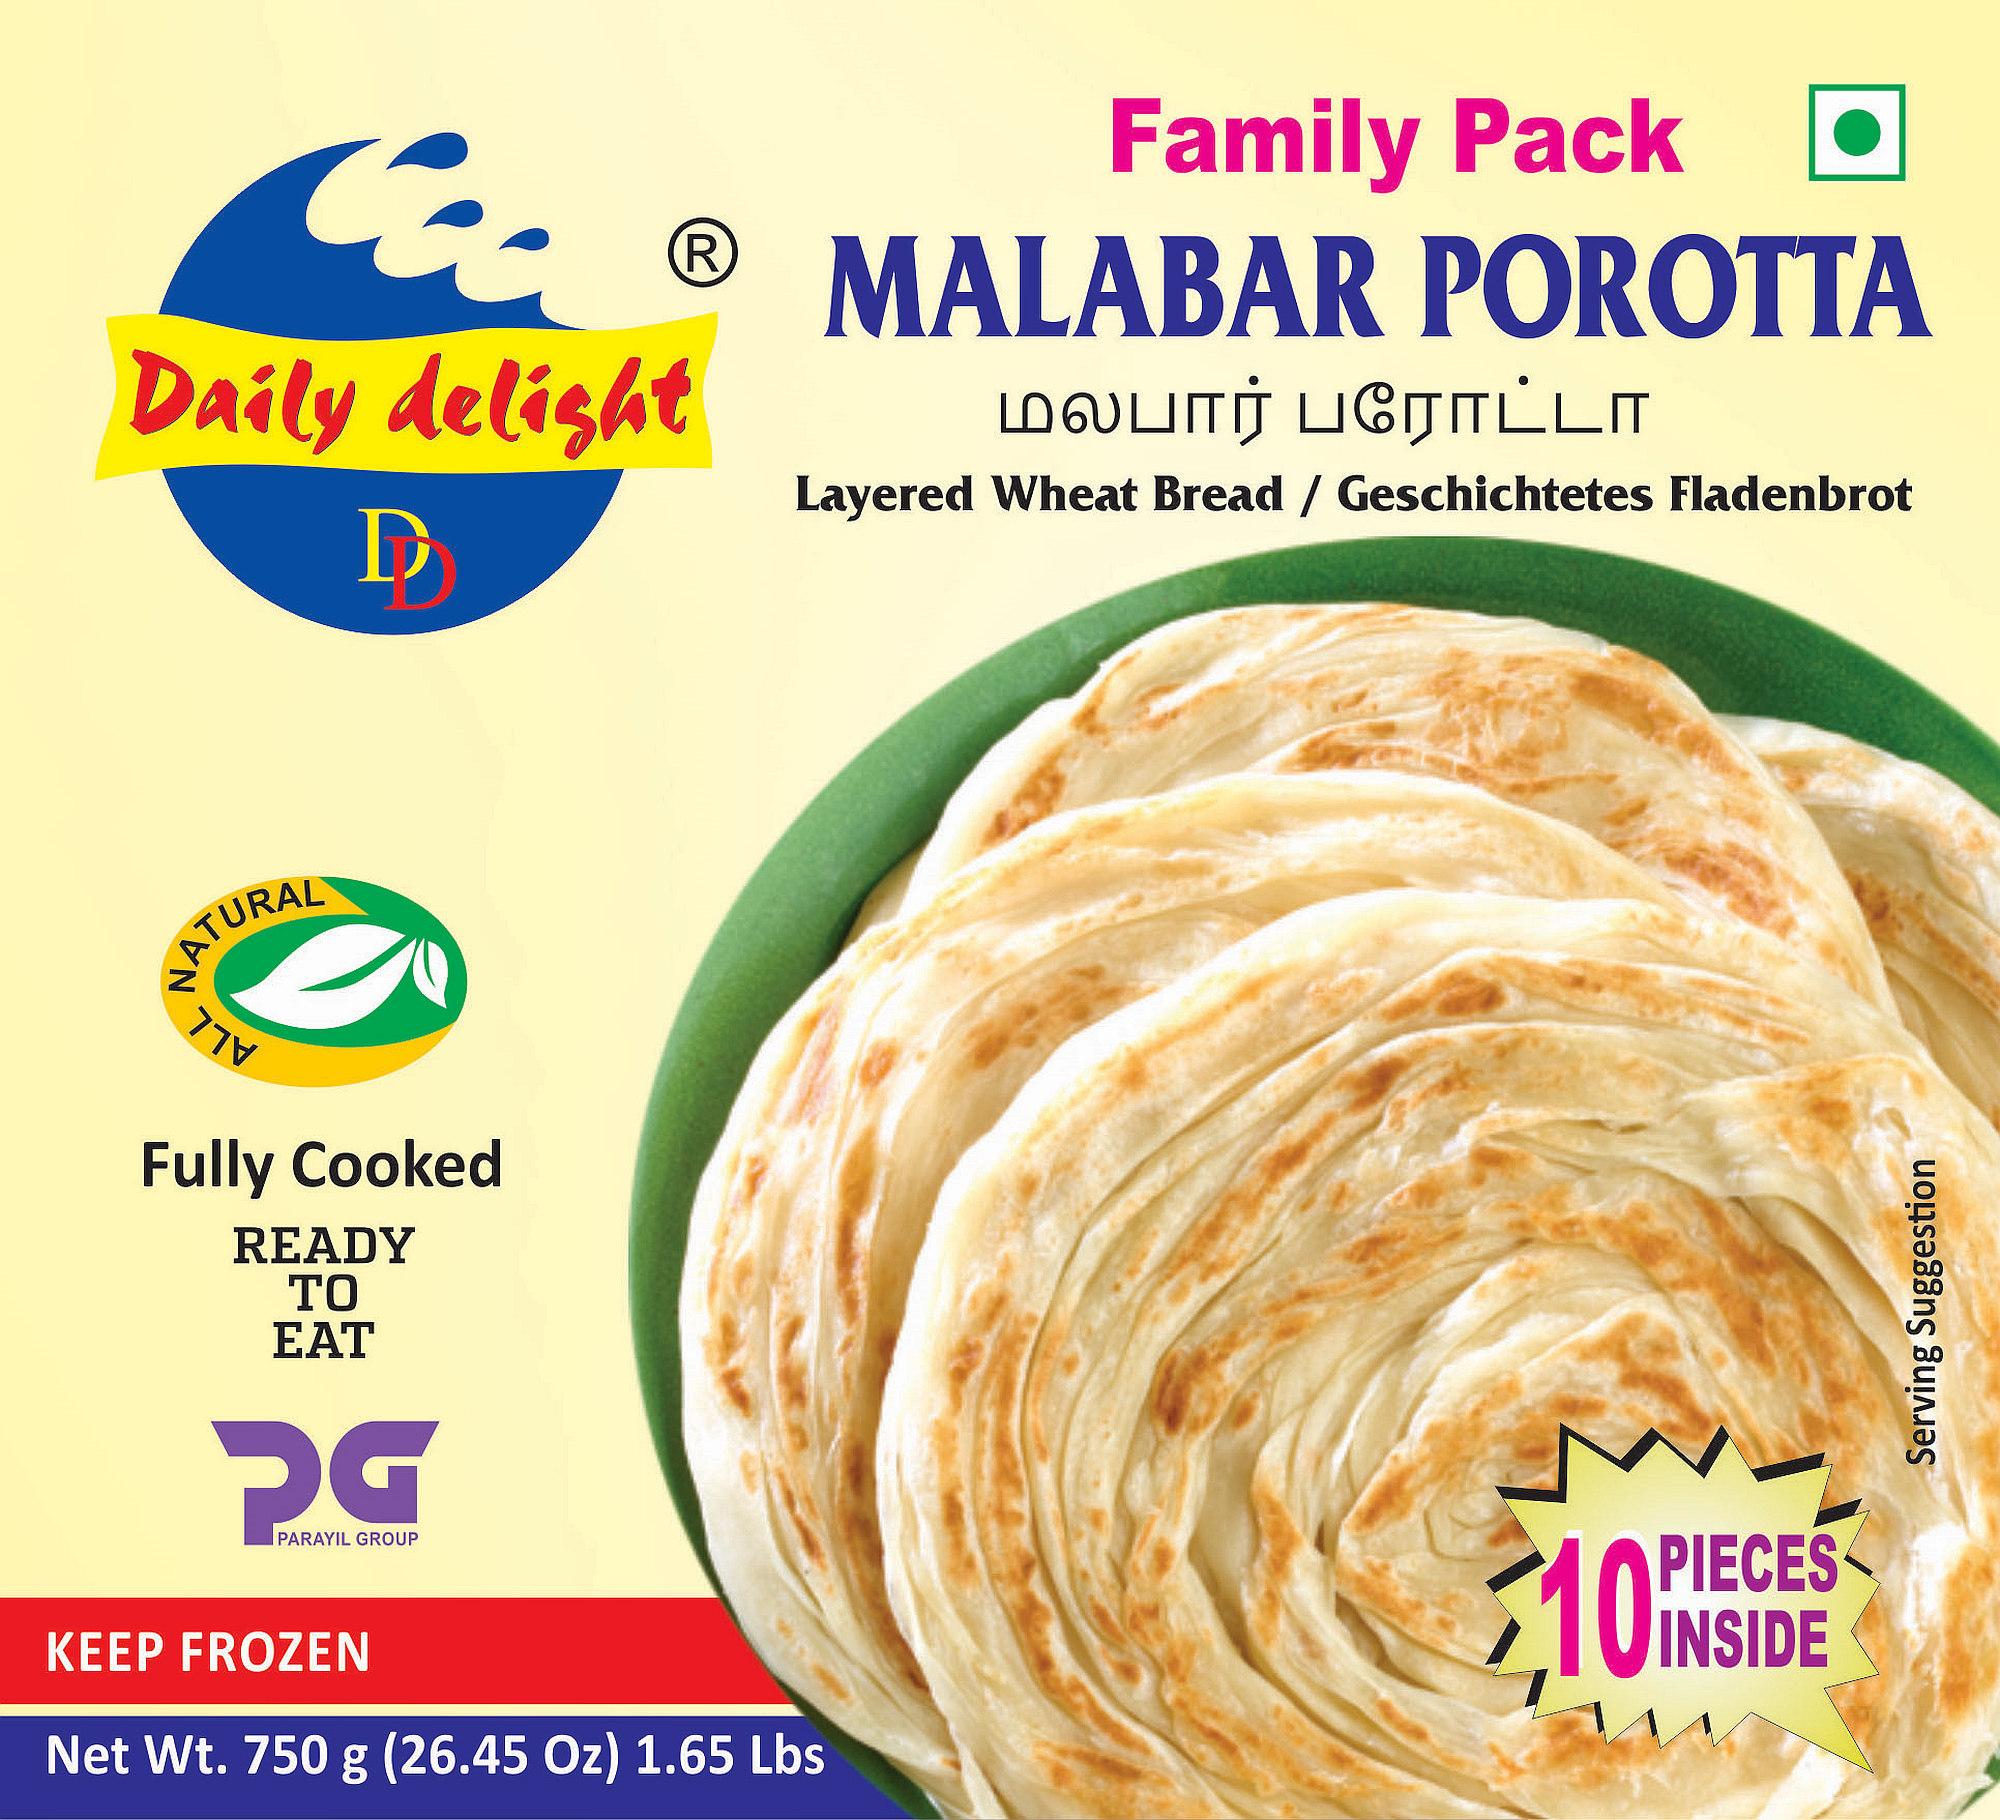 Daily Delight Porotta Malabar